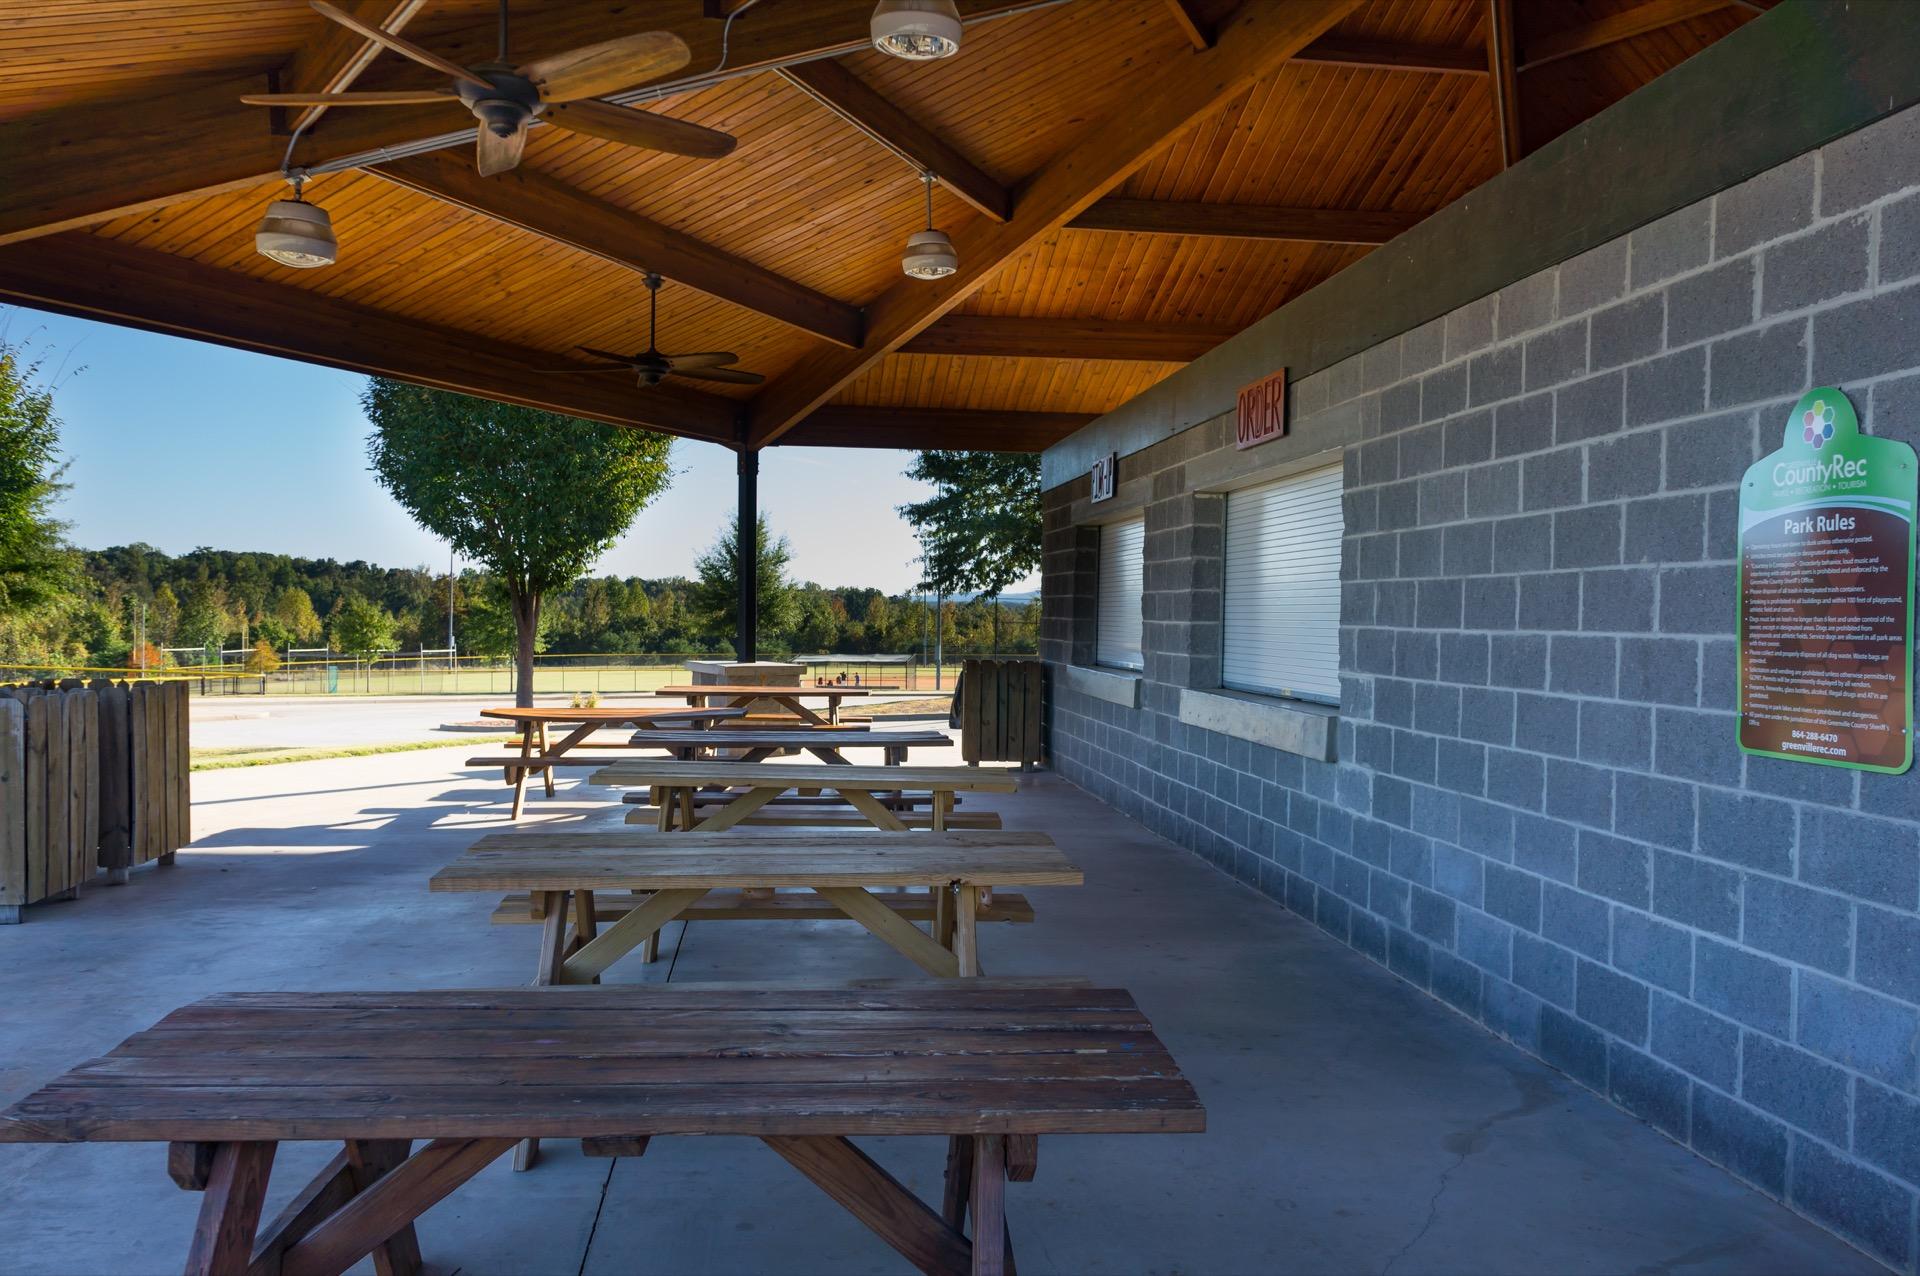 david jackson park shelter